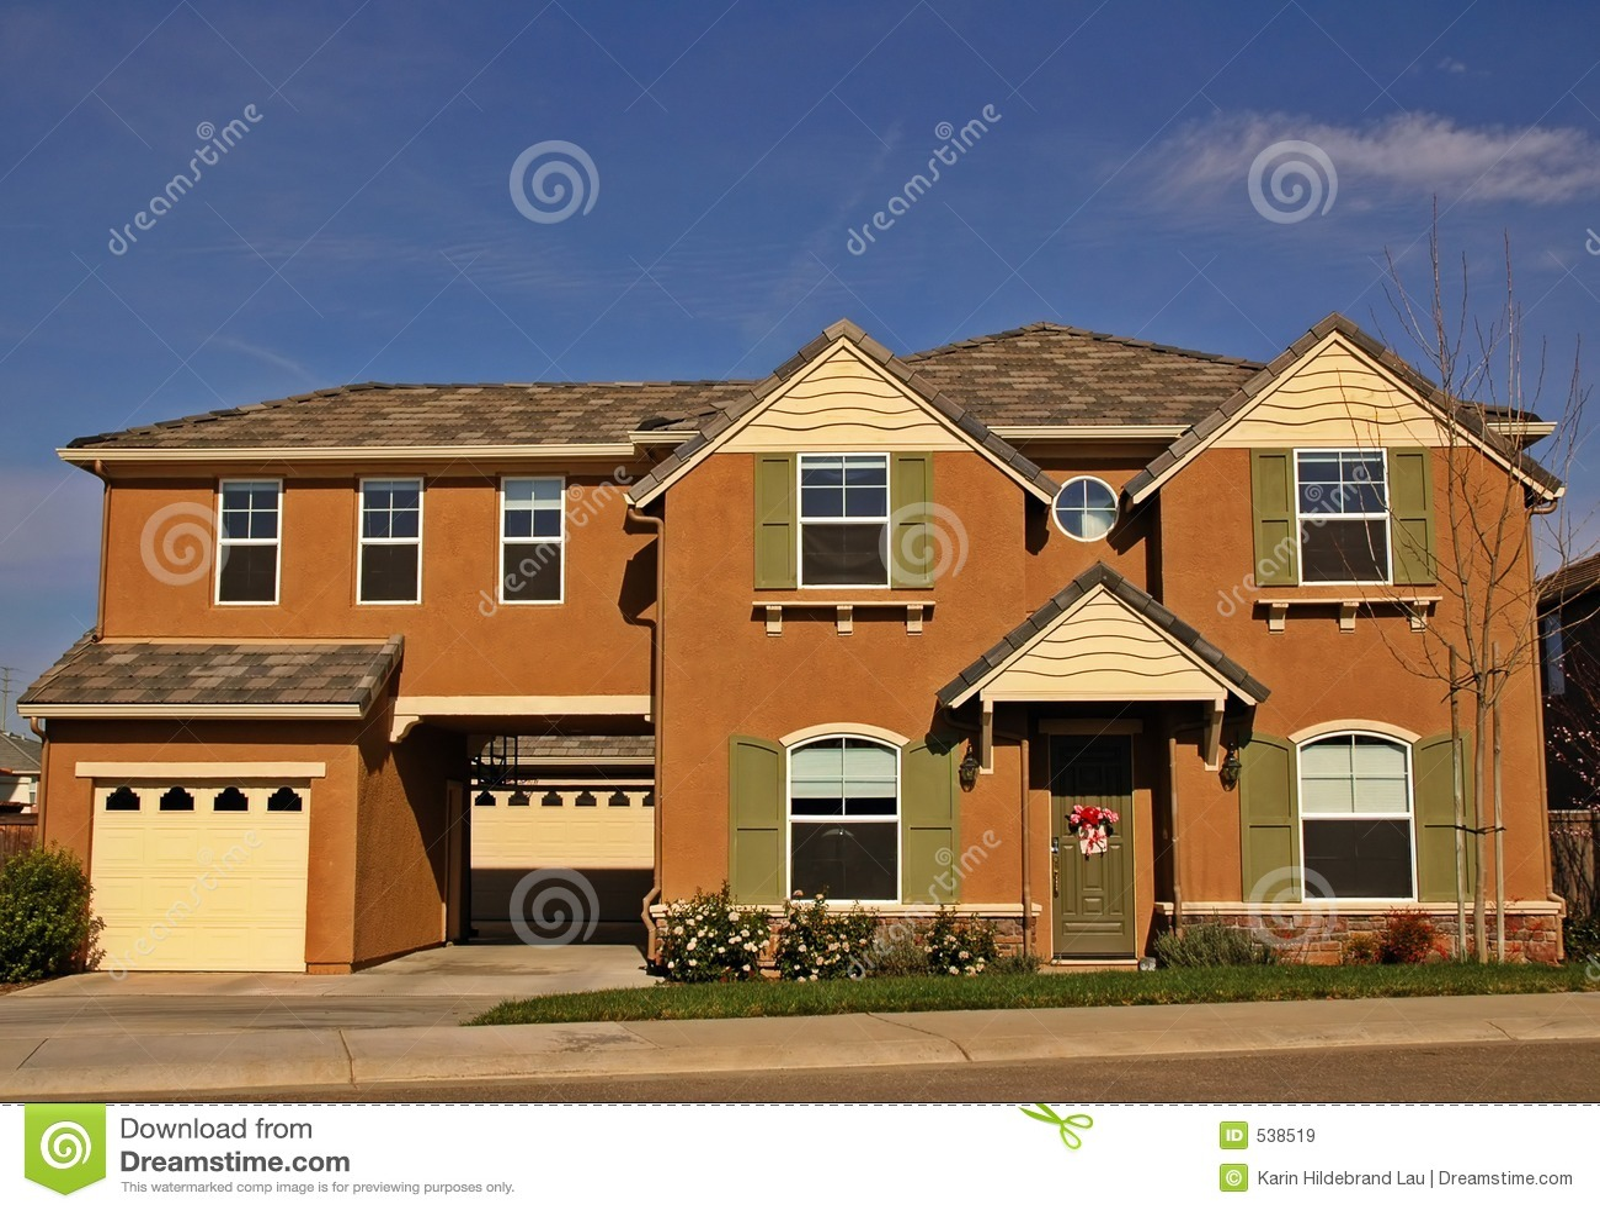 Download 家庭大 库存图片. 图片 包括有 邻里, 庄园, 停车库, bren, 重婚, 蓝色, 快门, 绿色, 灰泥 - 538519